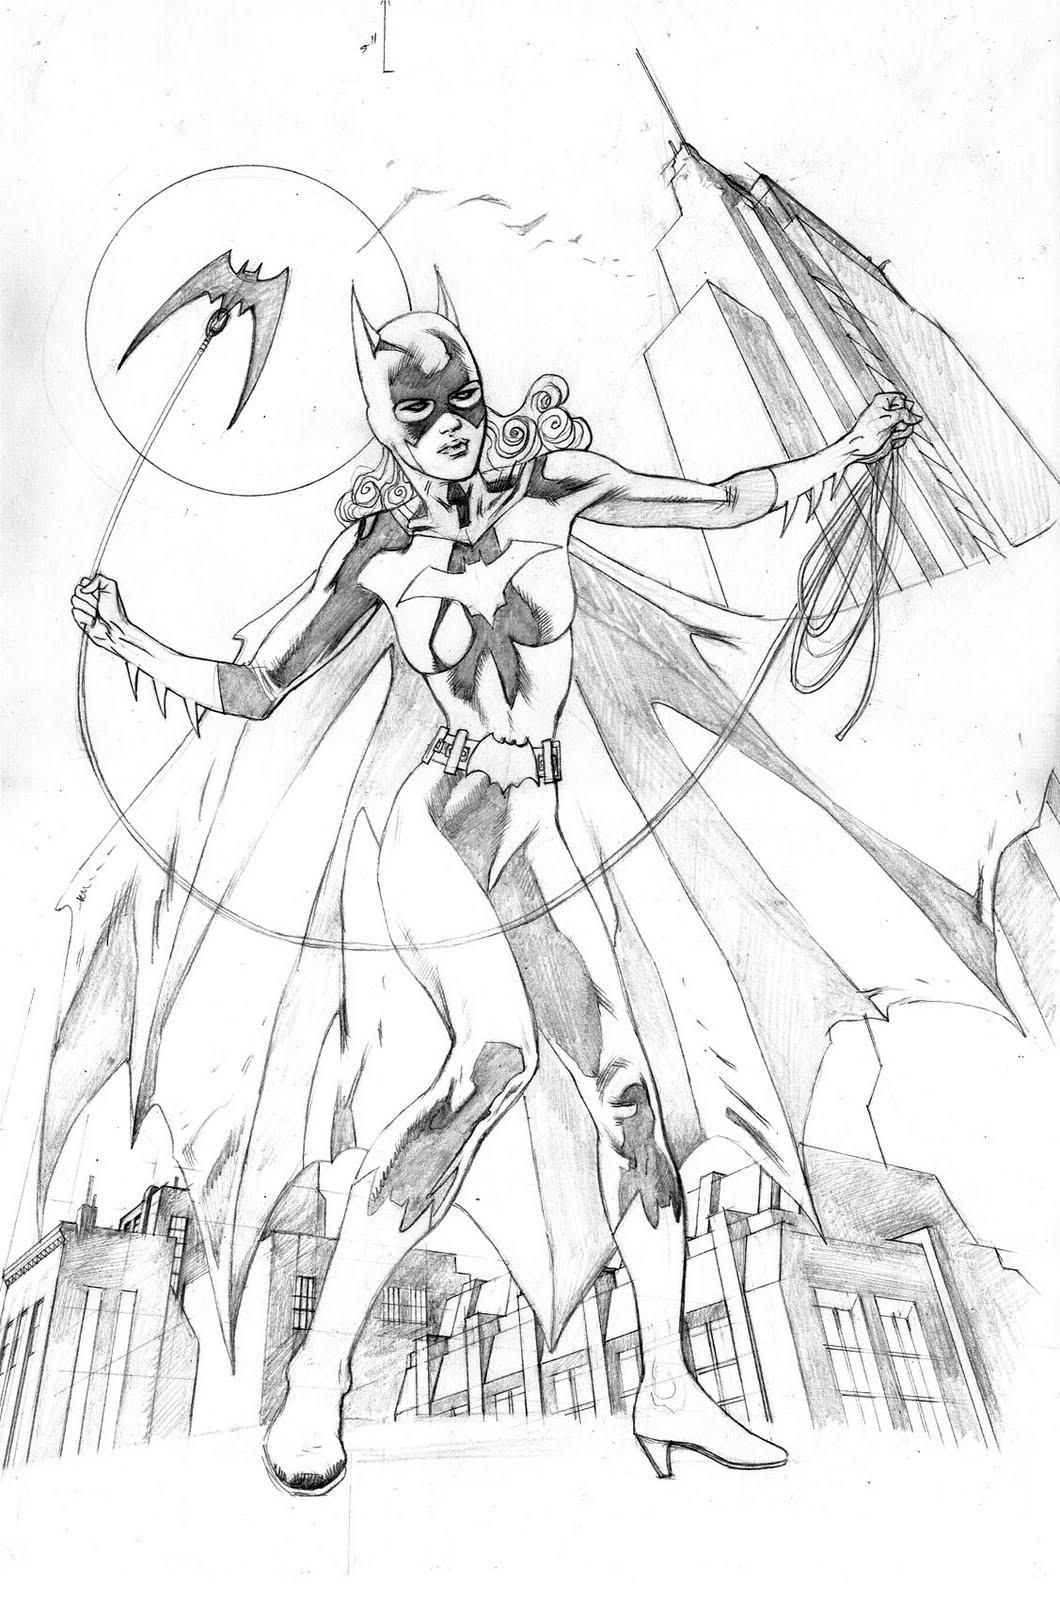 Coloring page - Batgirl | Lego coloring pages, Batman coloring ... | 1600x1060